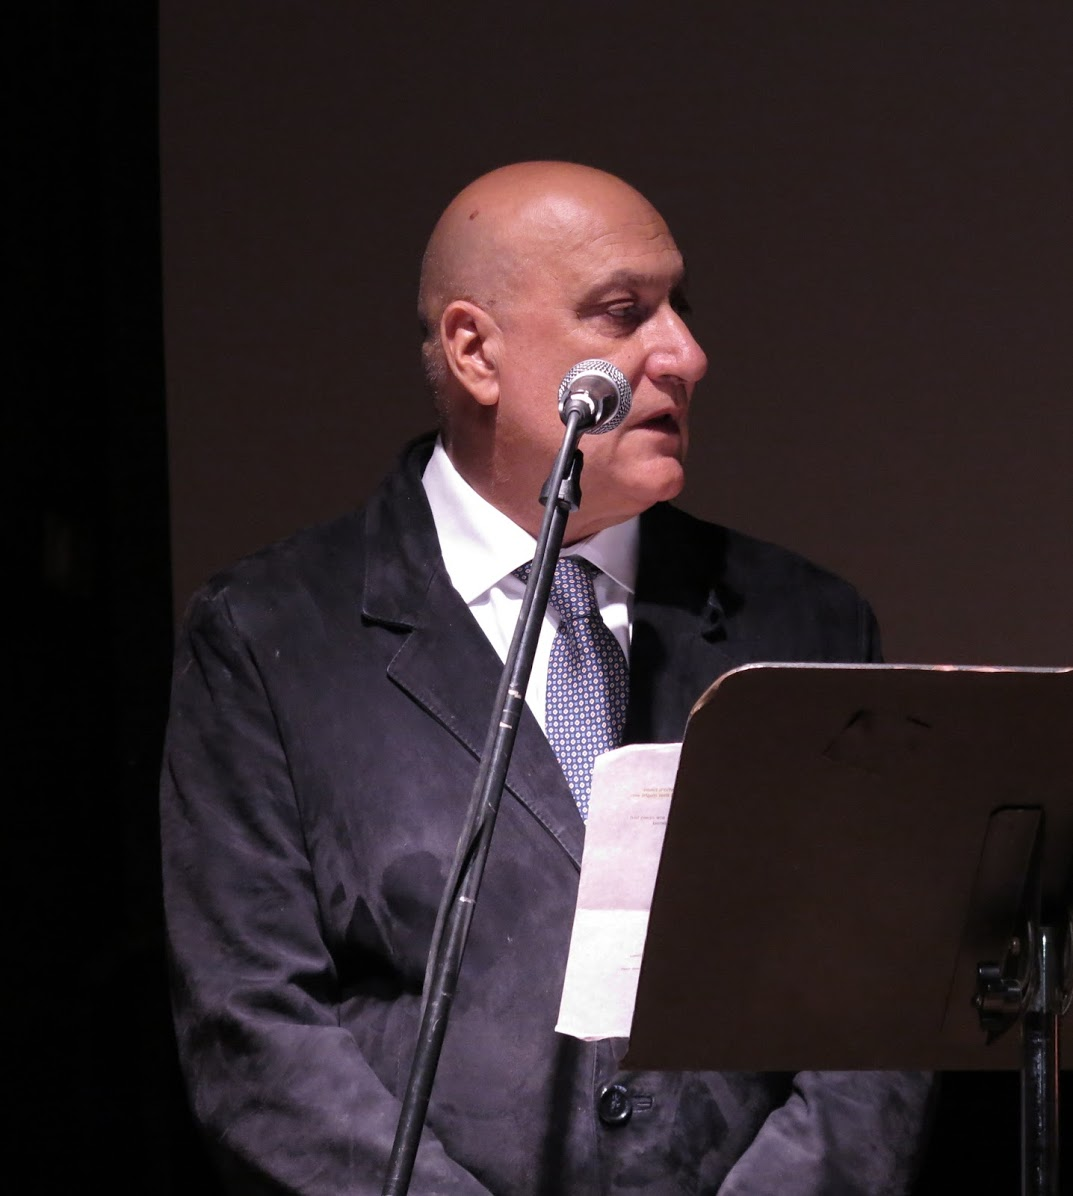 Dario D'Ambrosi